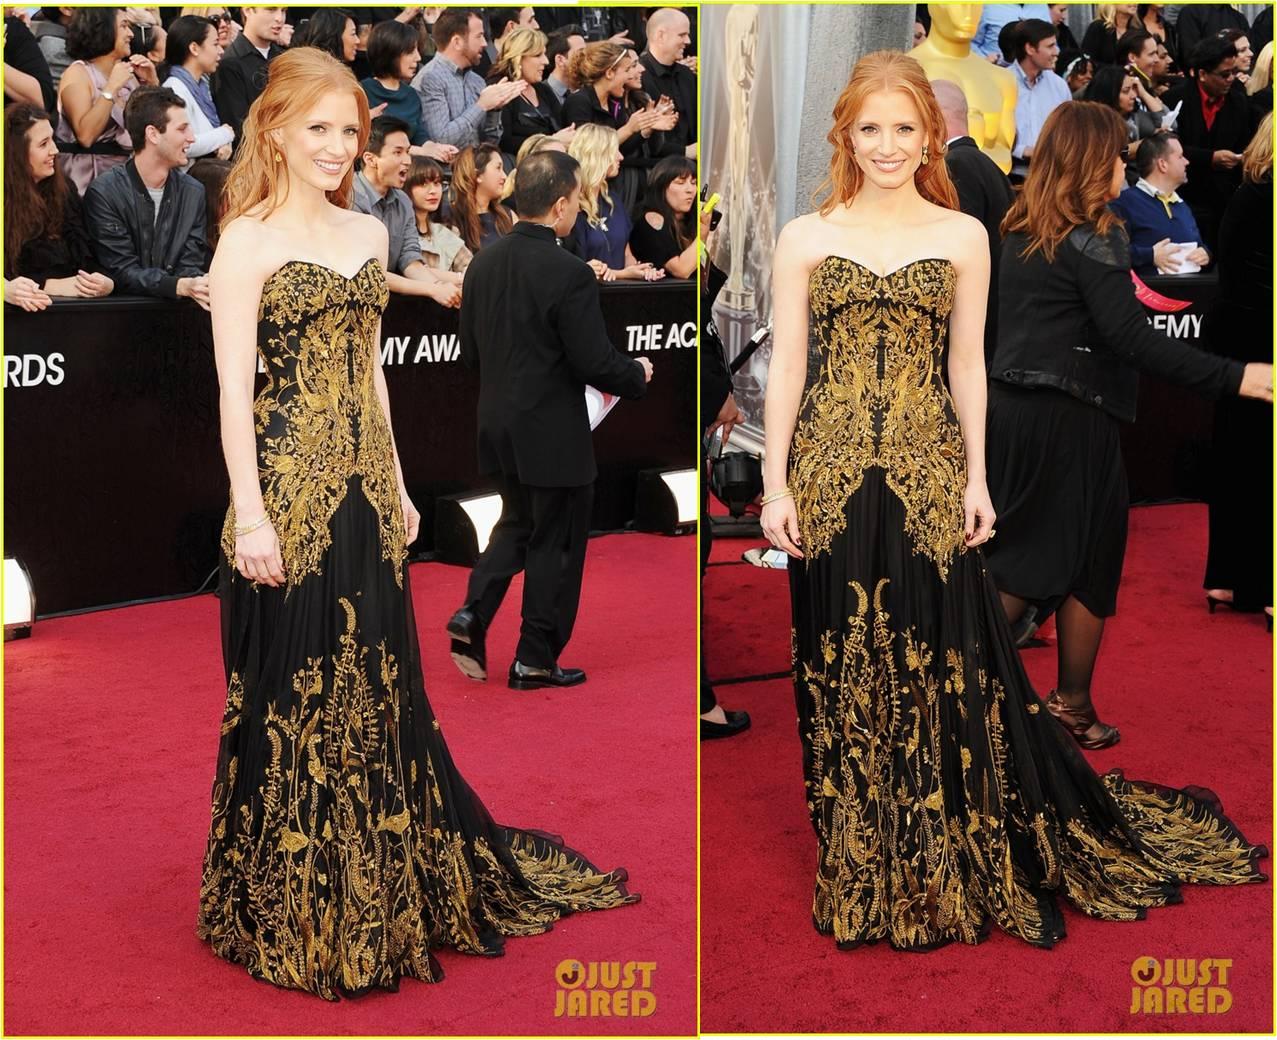 http://3.bp.blogspot.com/-J9J1PSgjKlM/T0uWepuUlNI/AAAAAAAAC-Y/nJtvbOhbrPg/s1600/Jennifer+Chastain+-Alex+McQueen.jpg